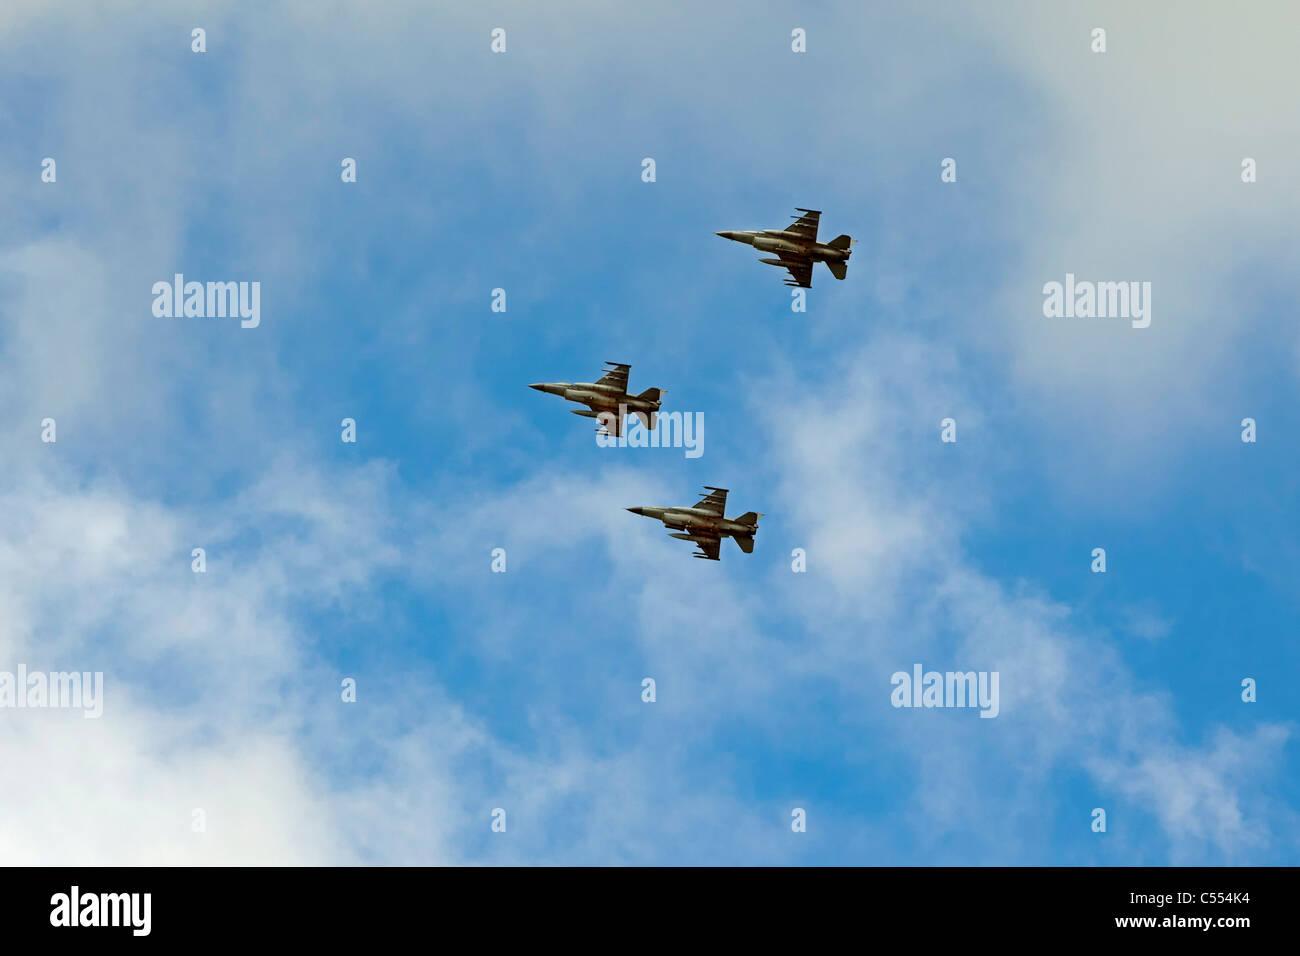 The Netherlands, Buren on Ameland, Island belonging to Wadden Sea Islands. Unesco World Heritage Site. F-16 fighter - Stock Image